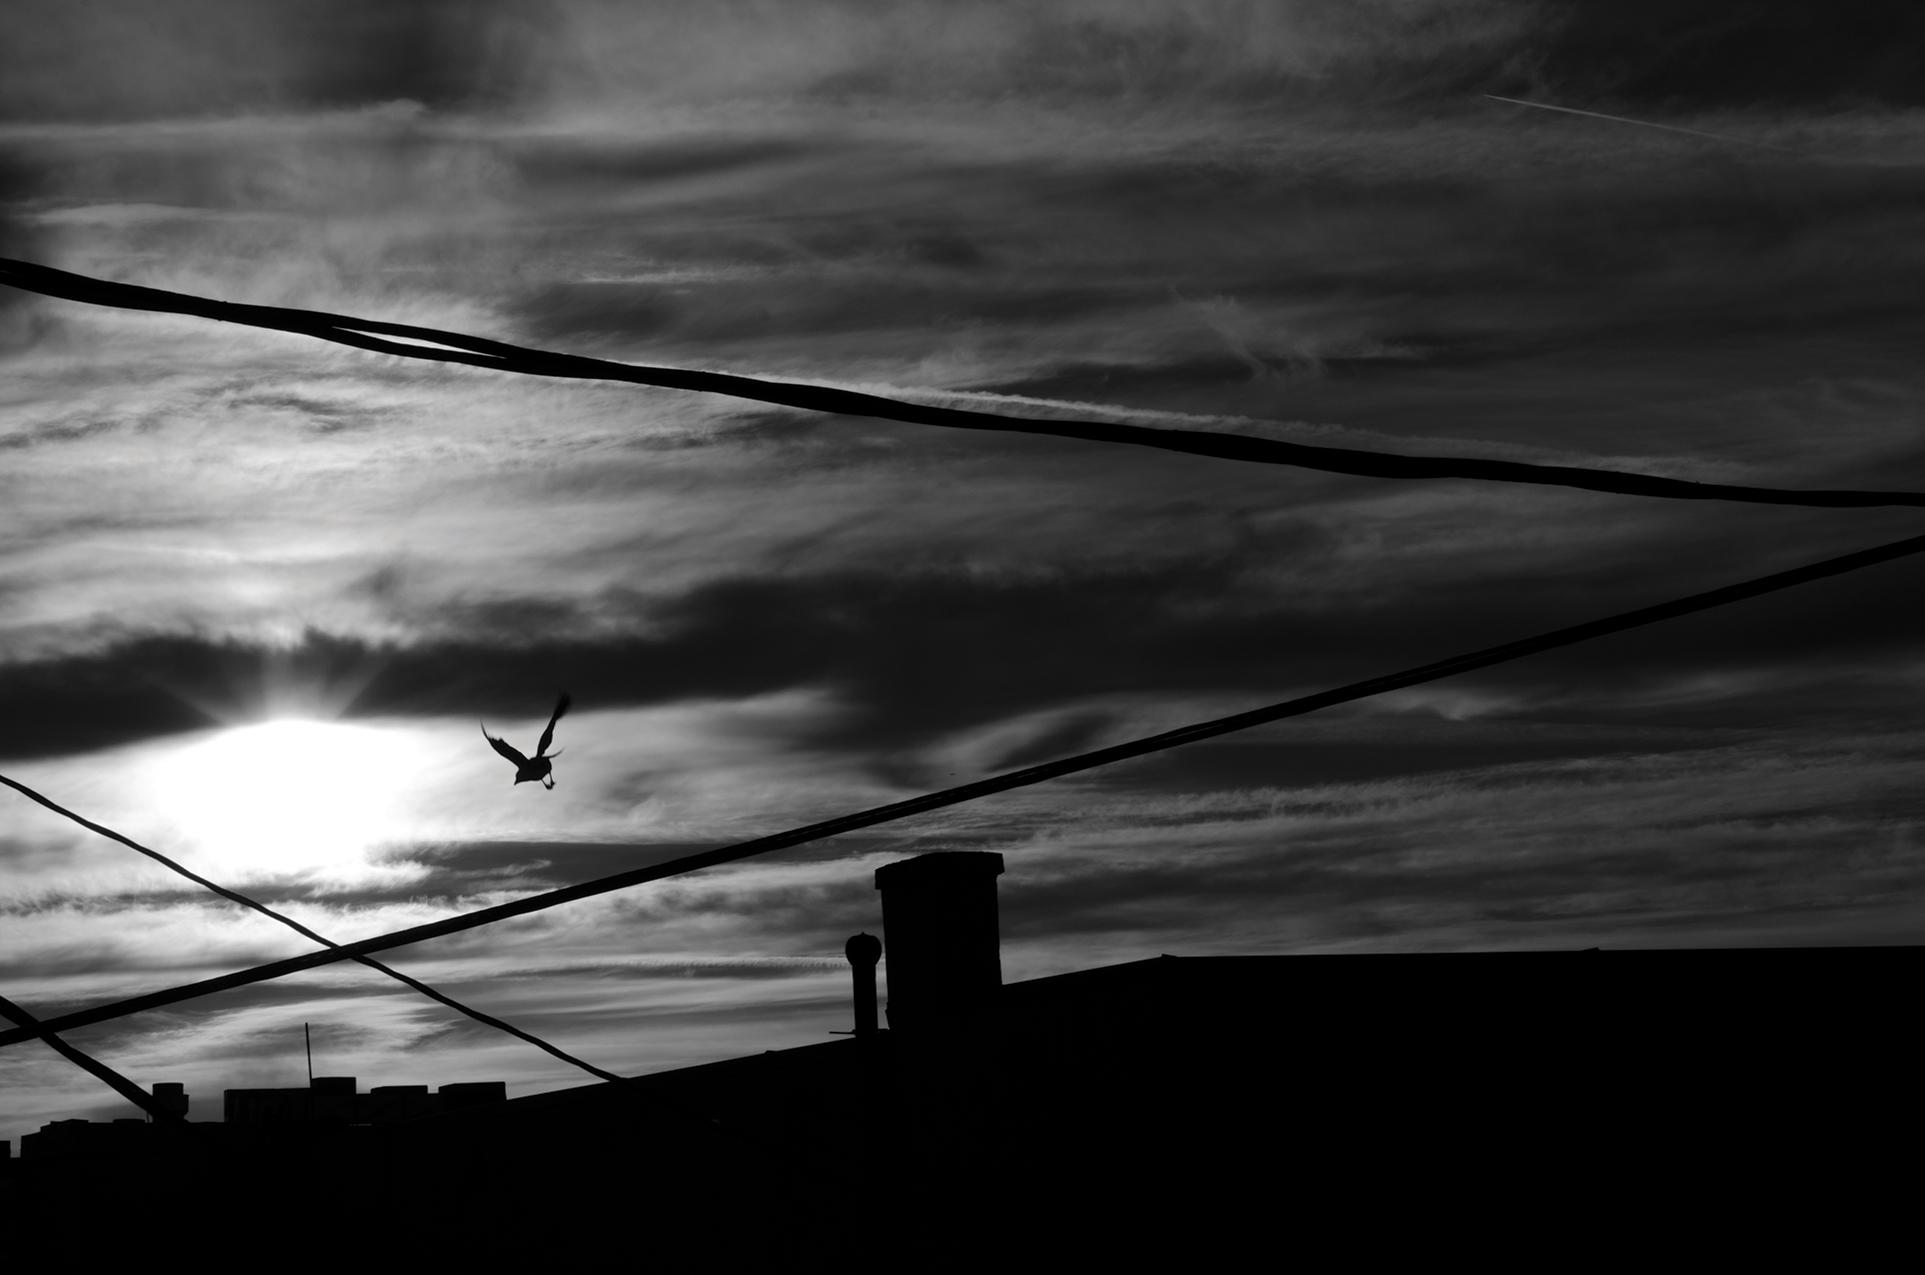 Sunset_Bird_BW-small-size.jpg